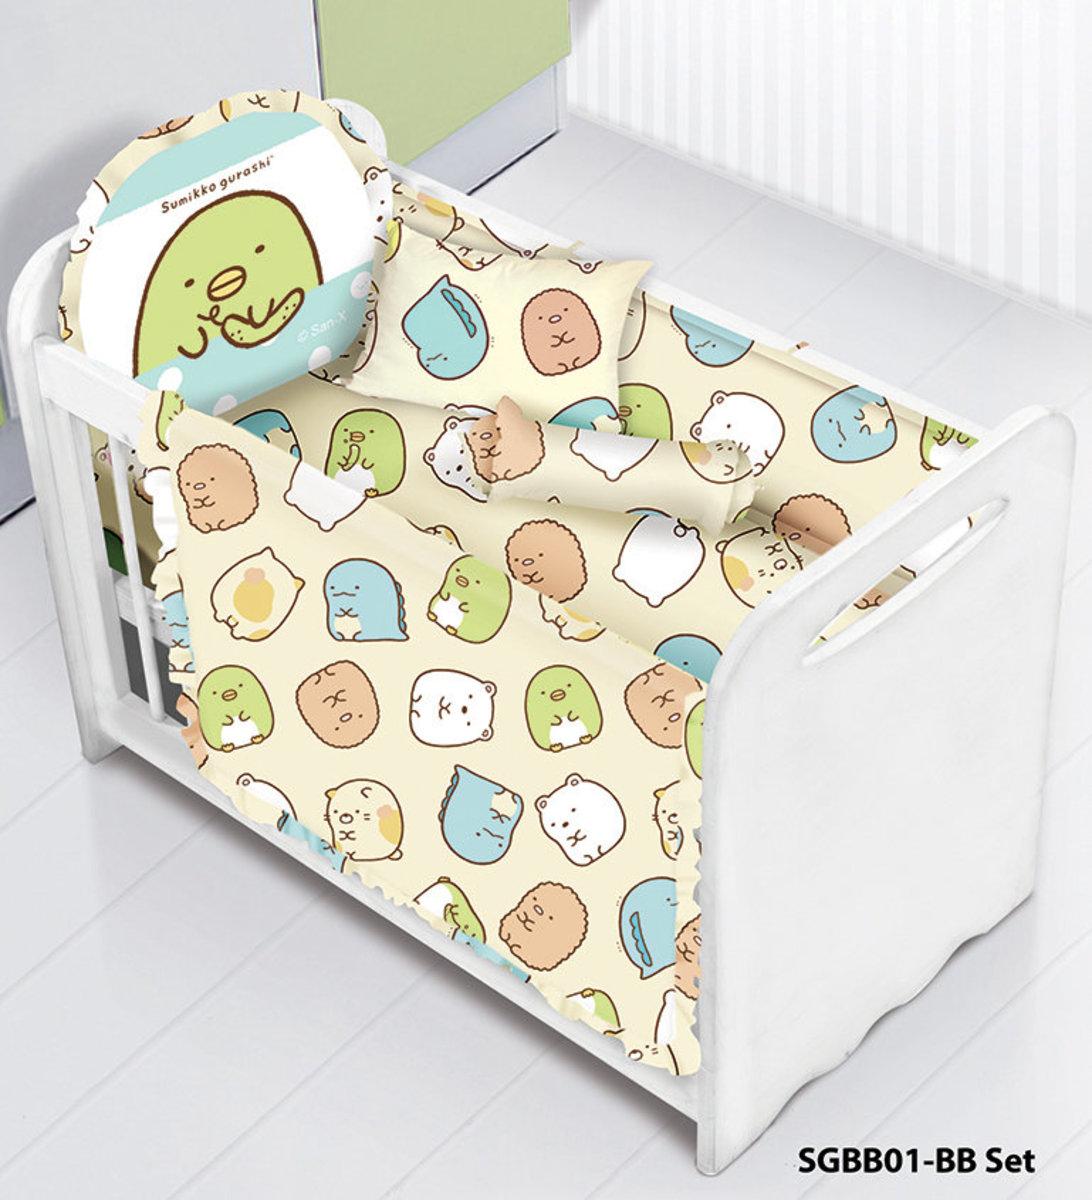 Cartoon 850 threads 12pcs Baby Set(SGBB01-BBSet)